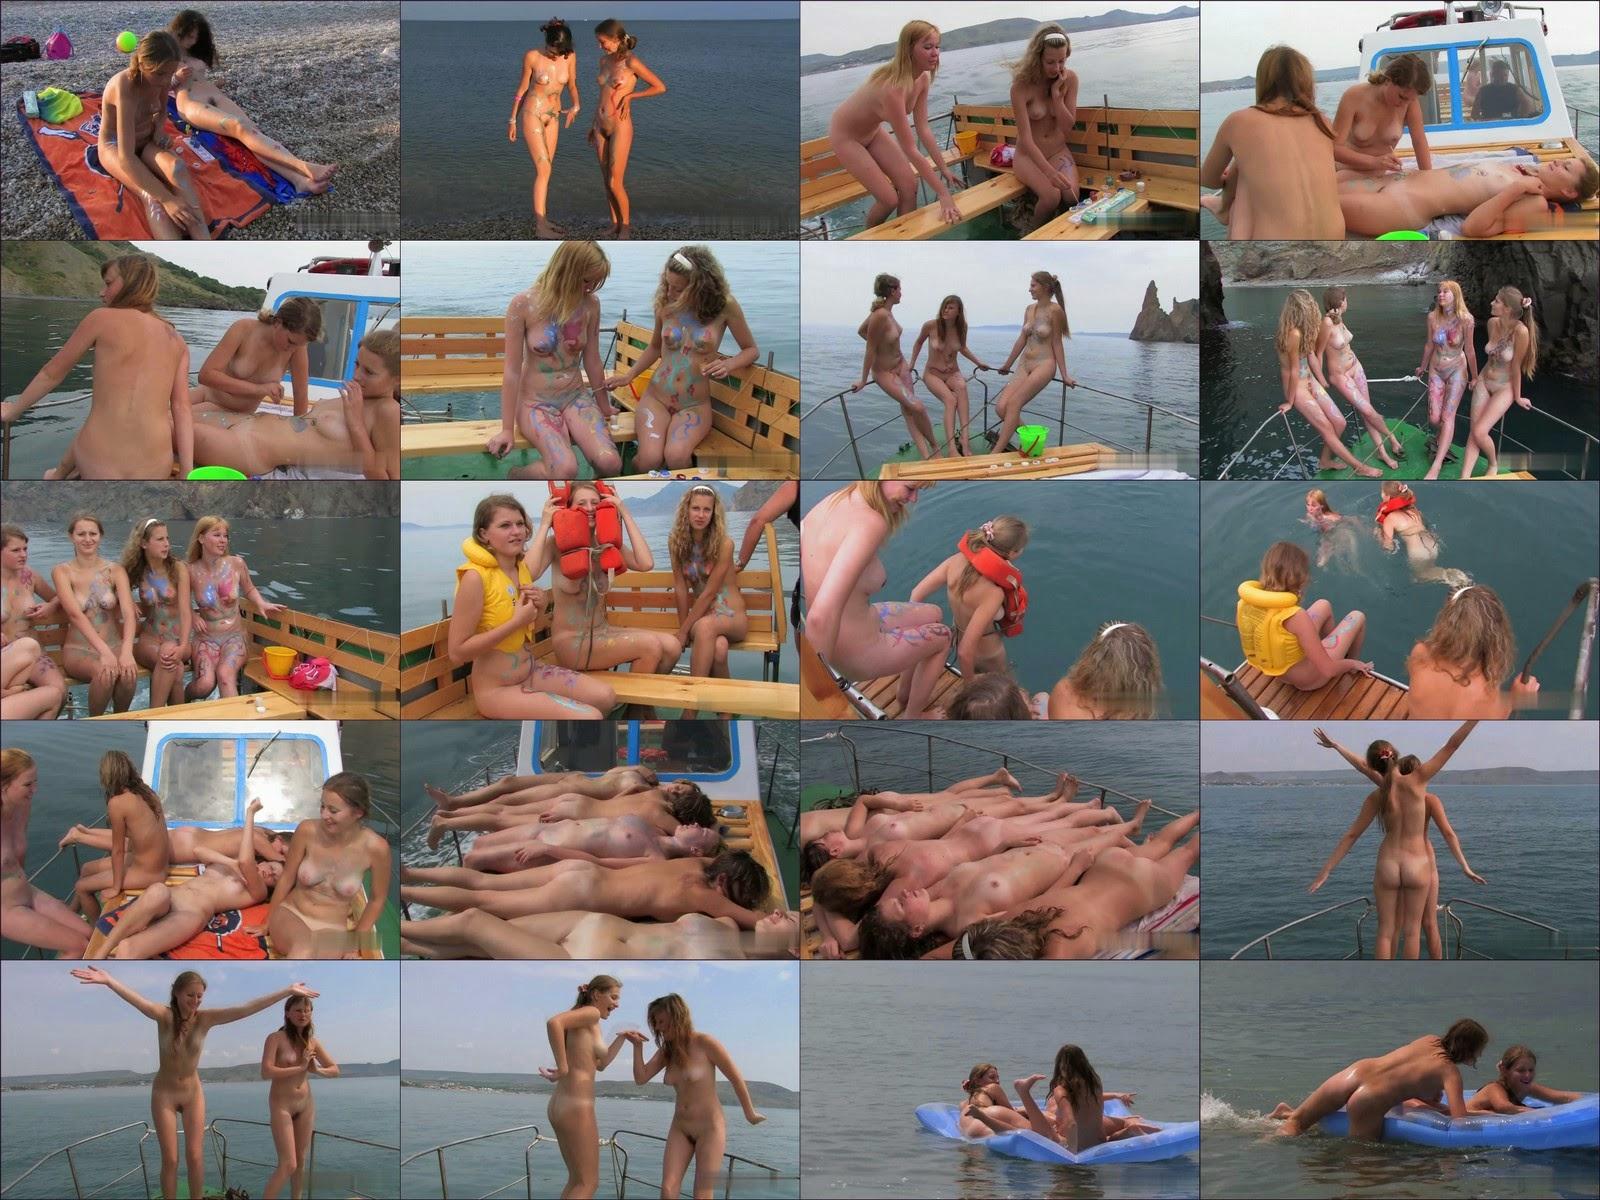 Body Art Nudist Beach. Part 2. Full version.